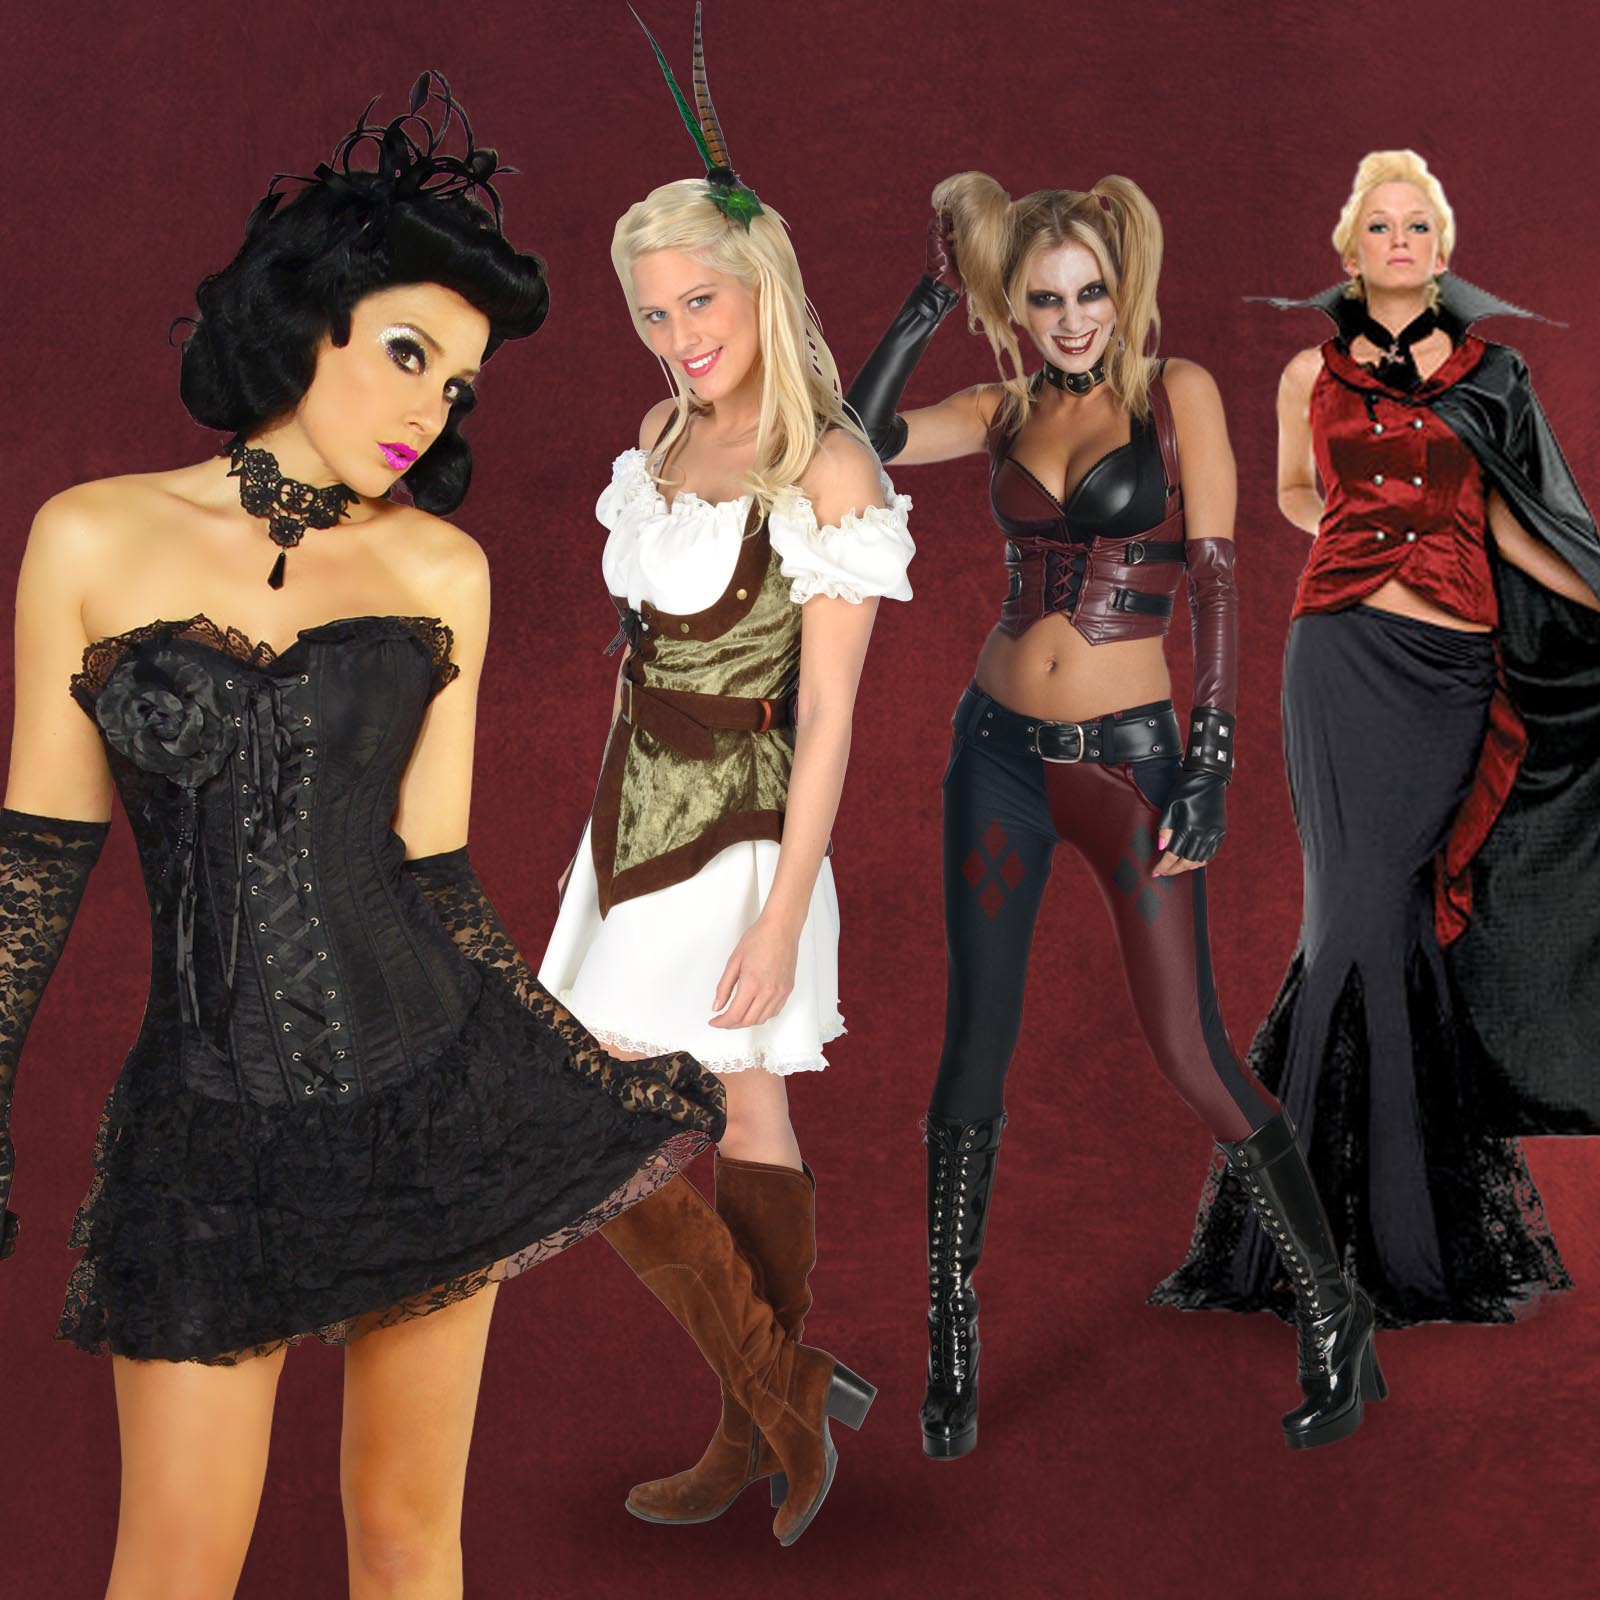 sexy kost me kleider damen kurz f r karneval party disco. Black Bedroom Furniture Sets. Home Design Ideas